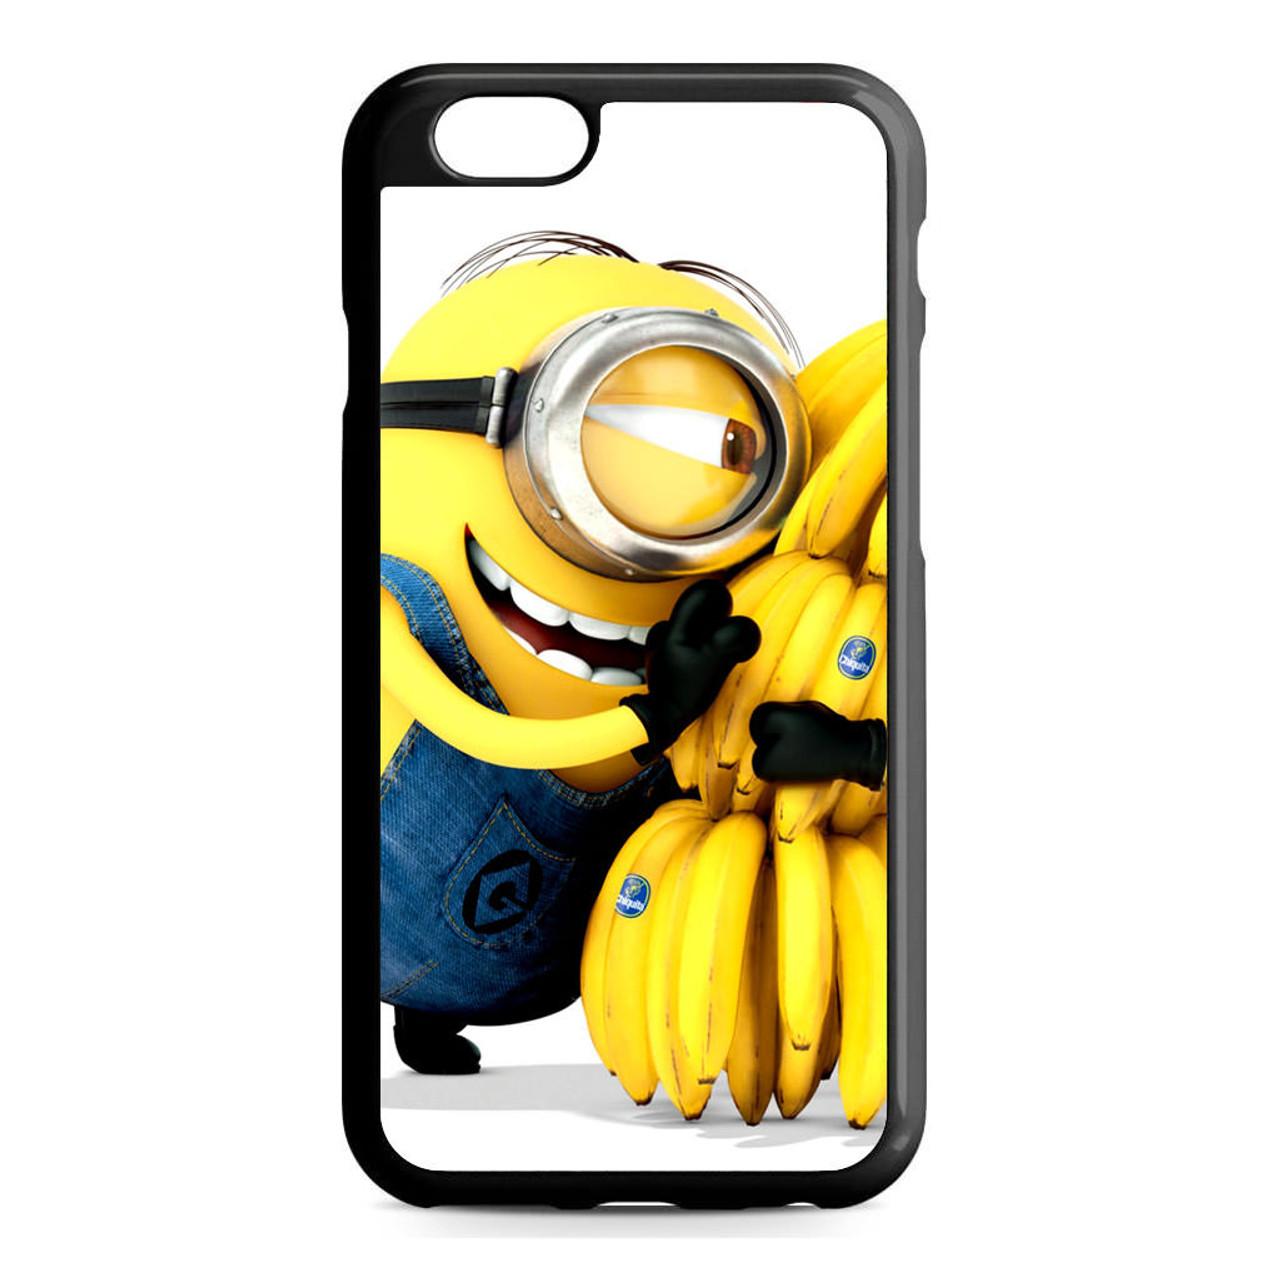 pretty nice cdfa1 5f30d Despicable Me Minions Banana iPhone 6/6S Case